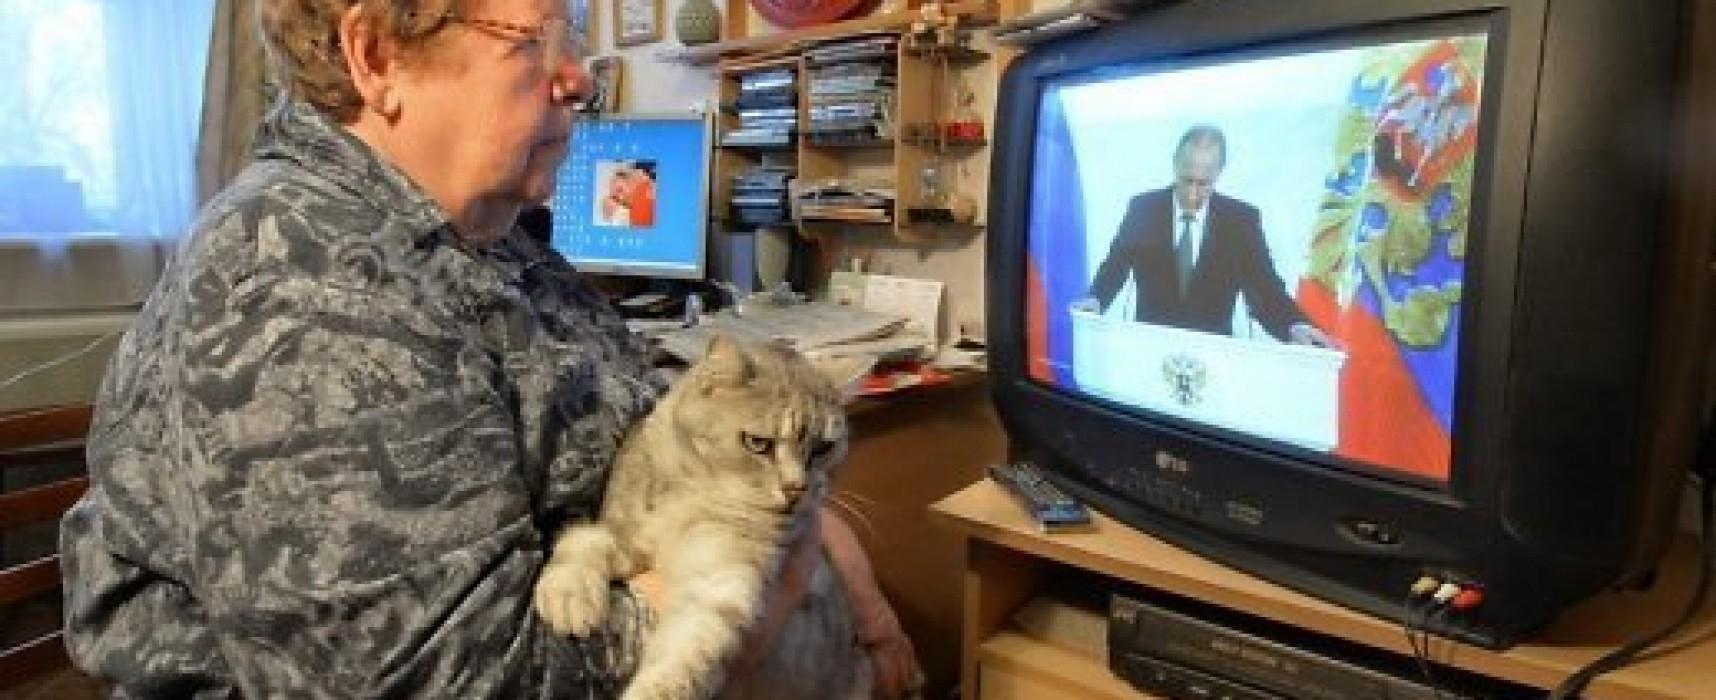 Viktoras Denisenko: New Russian propaganda – primitive but effective